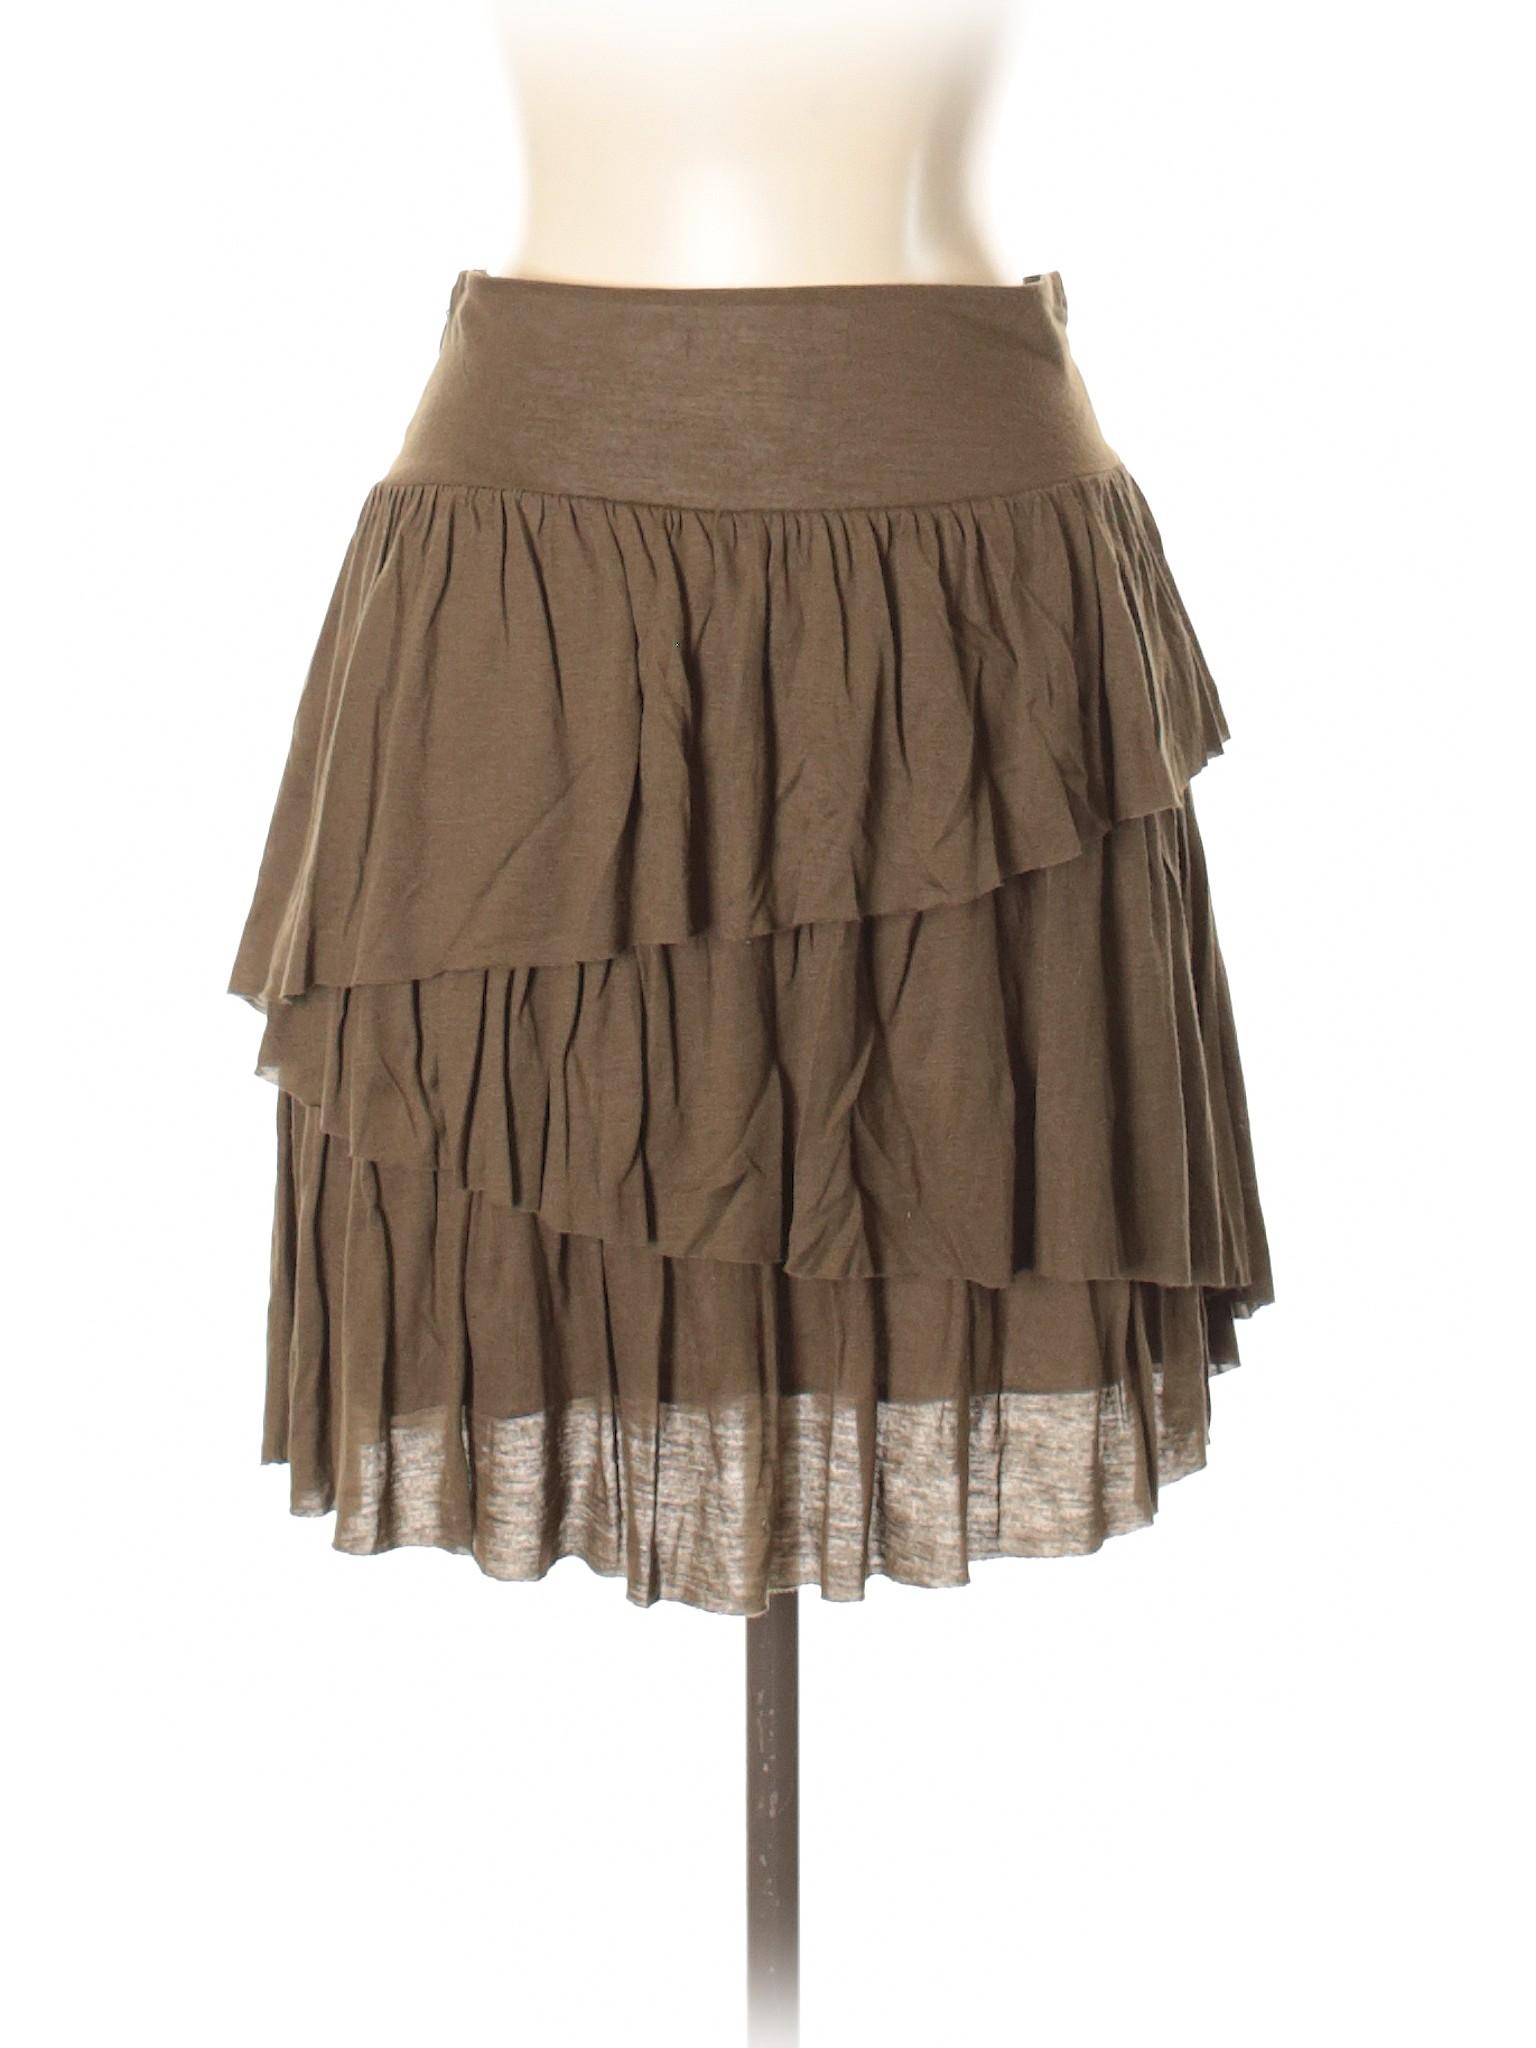 Boutique Boutique Casual Skirt Skirt Casual TzOFTnx